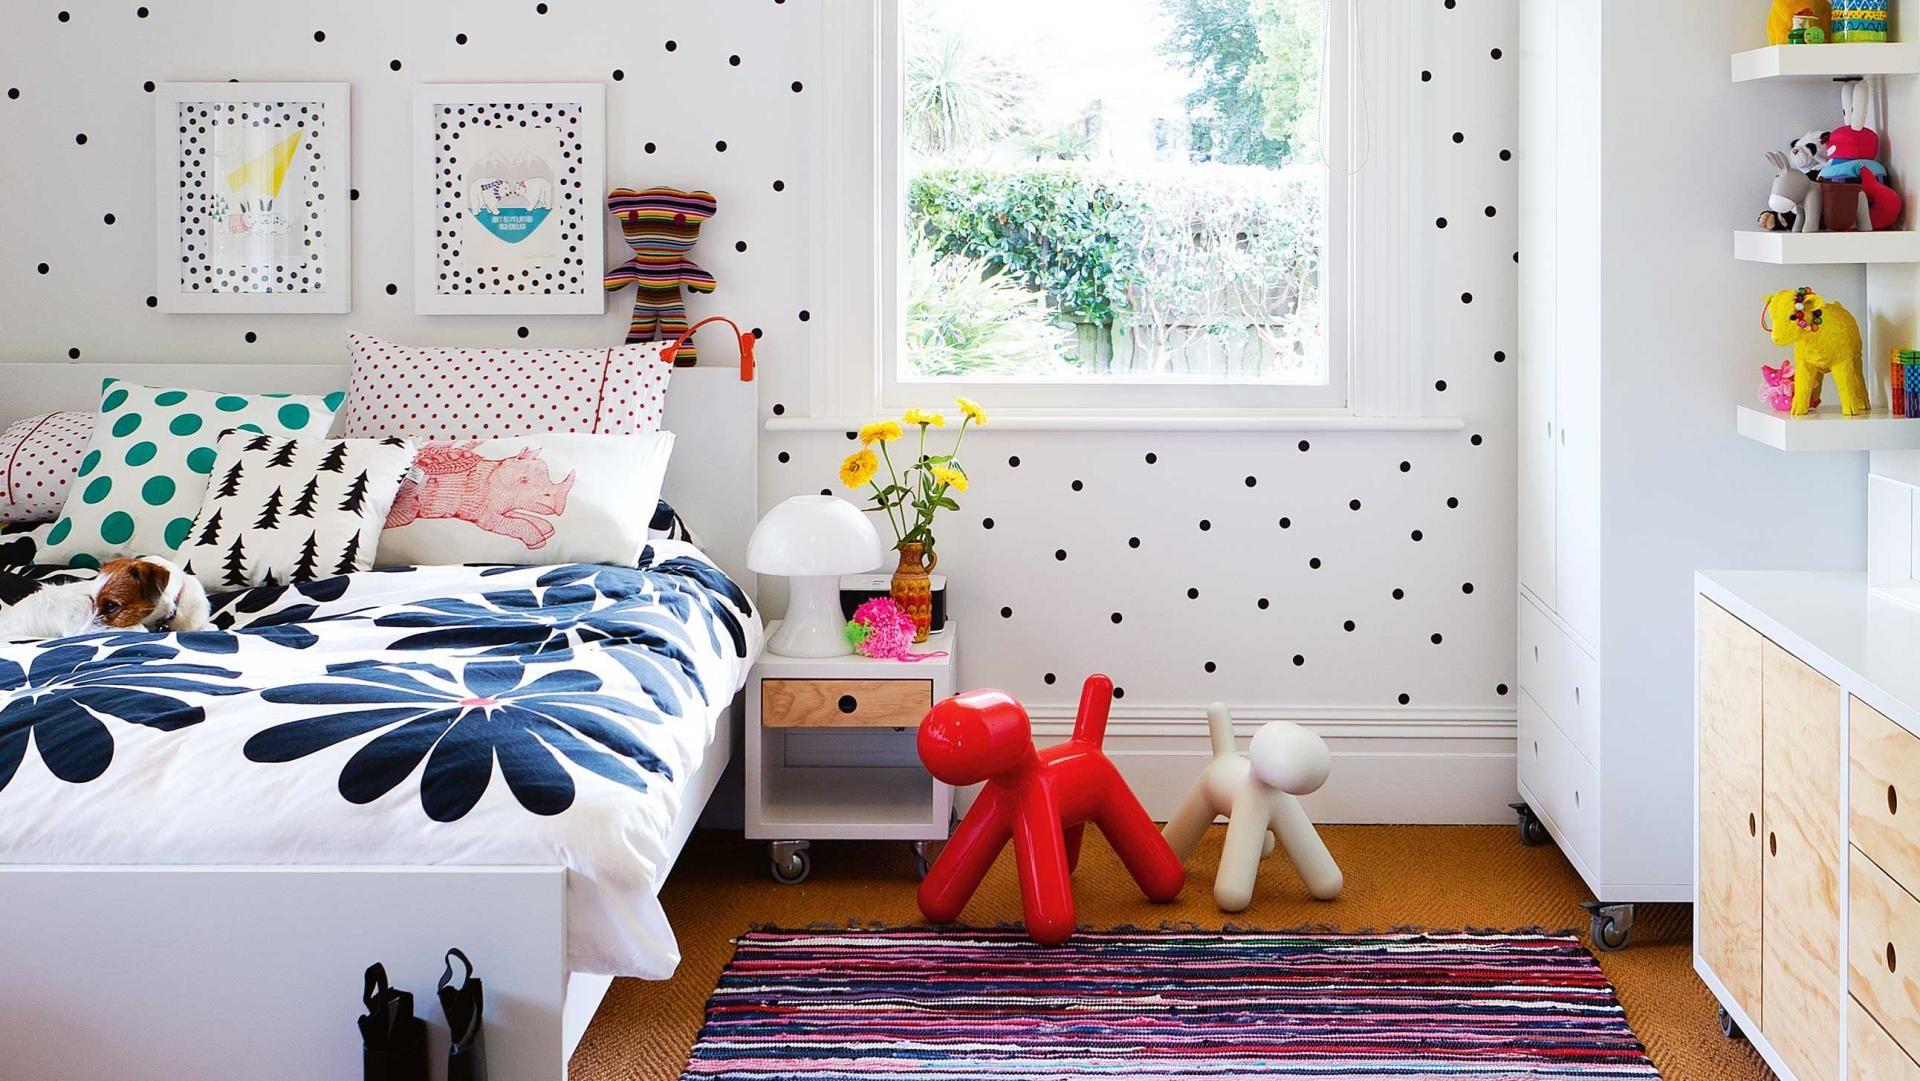 kidsu0027 bedroom walls 6 fun decorating ideas